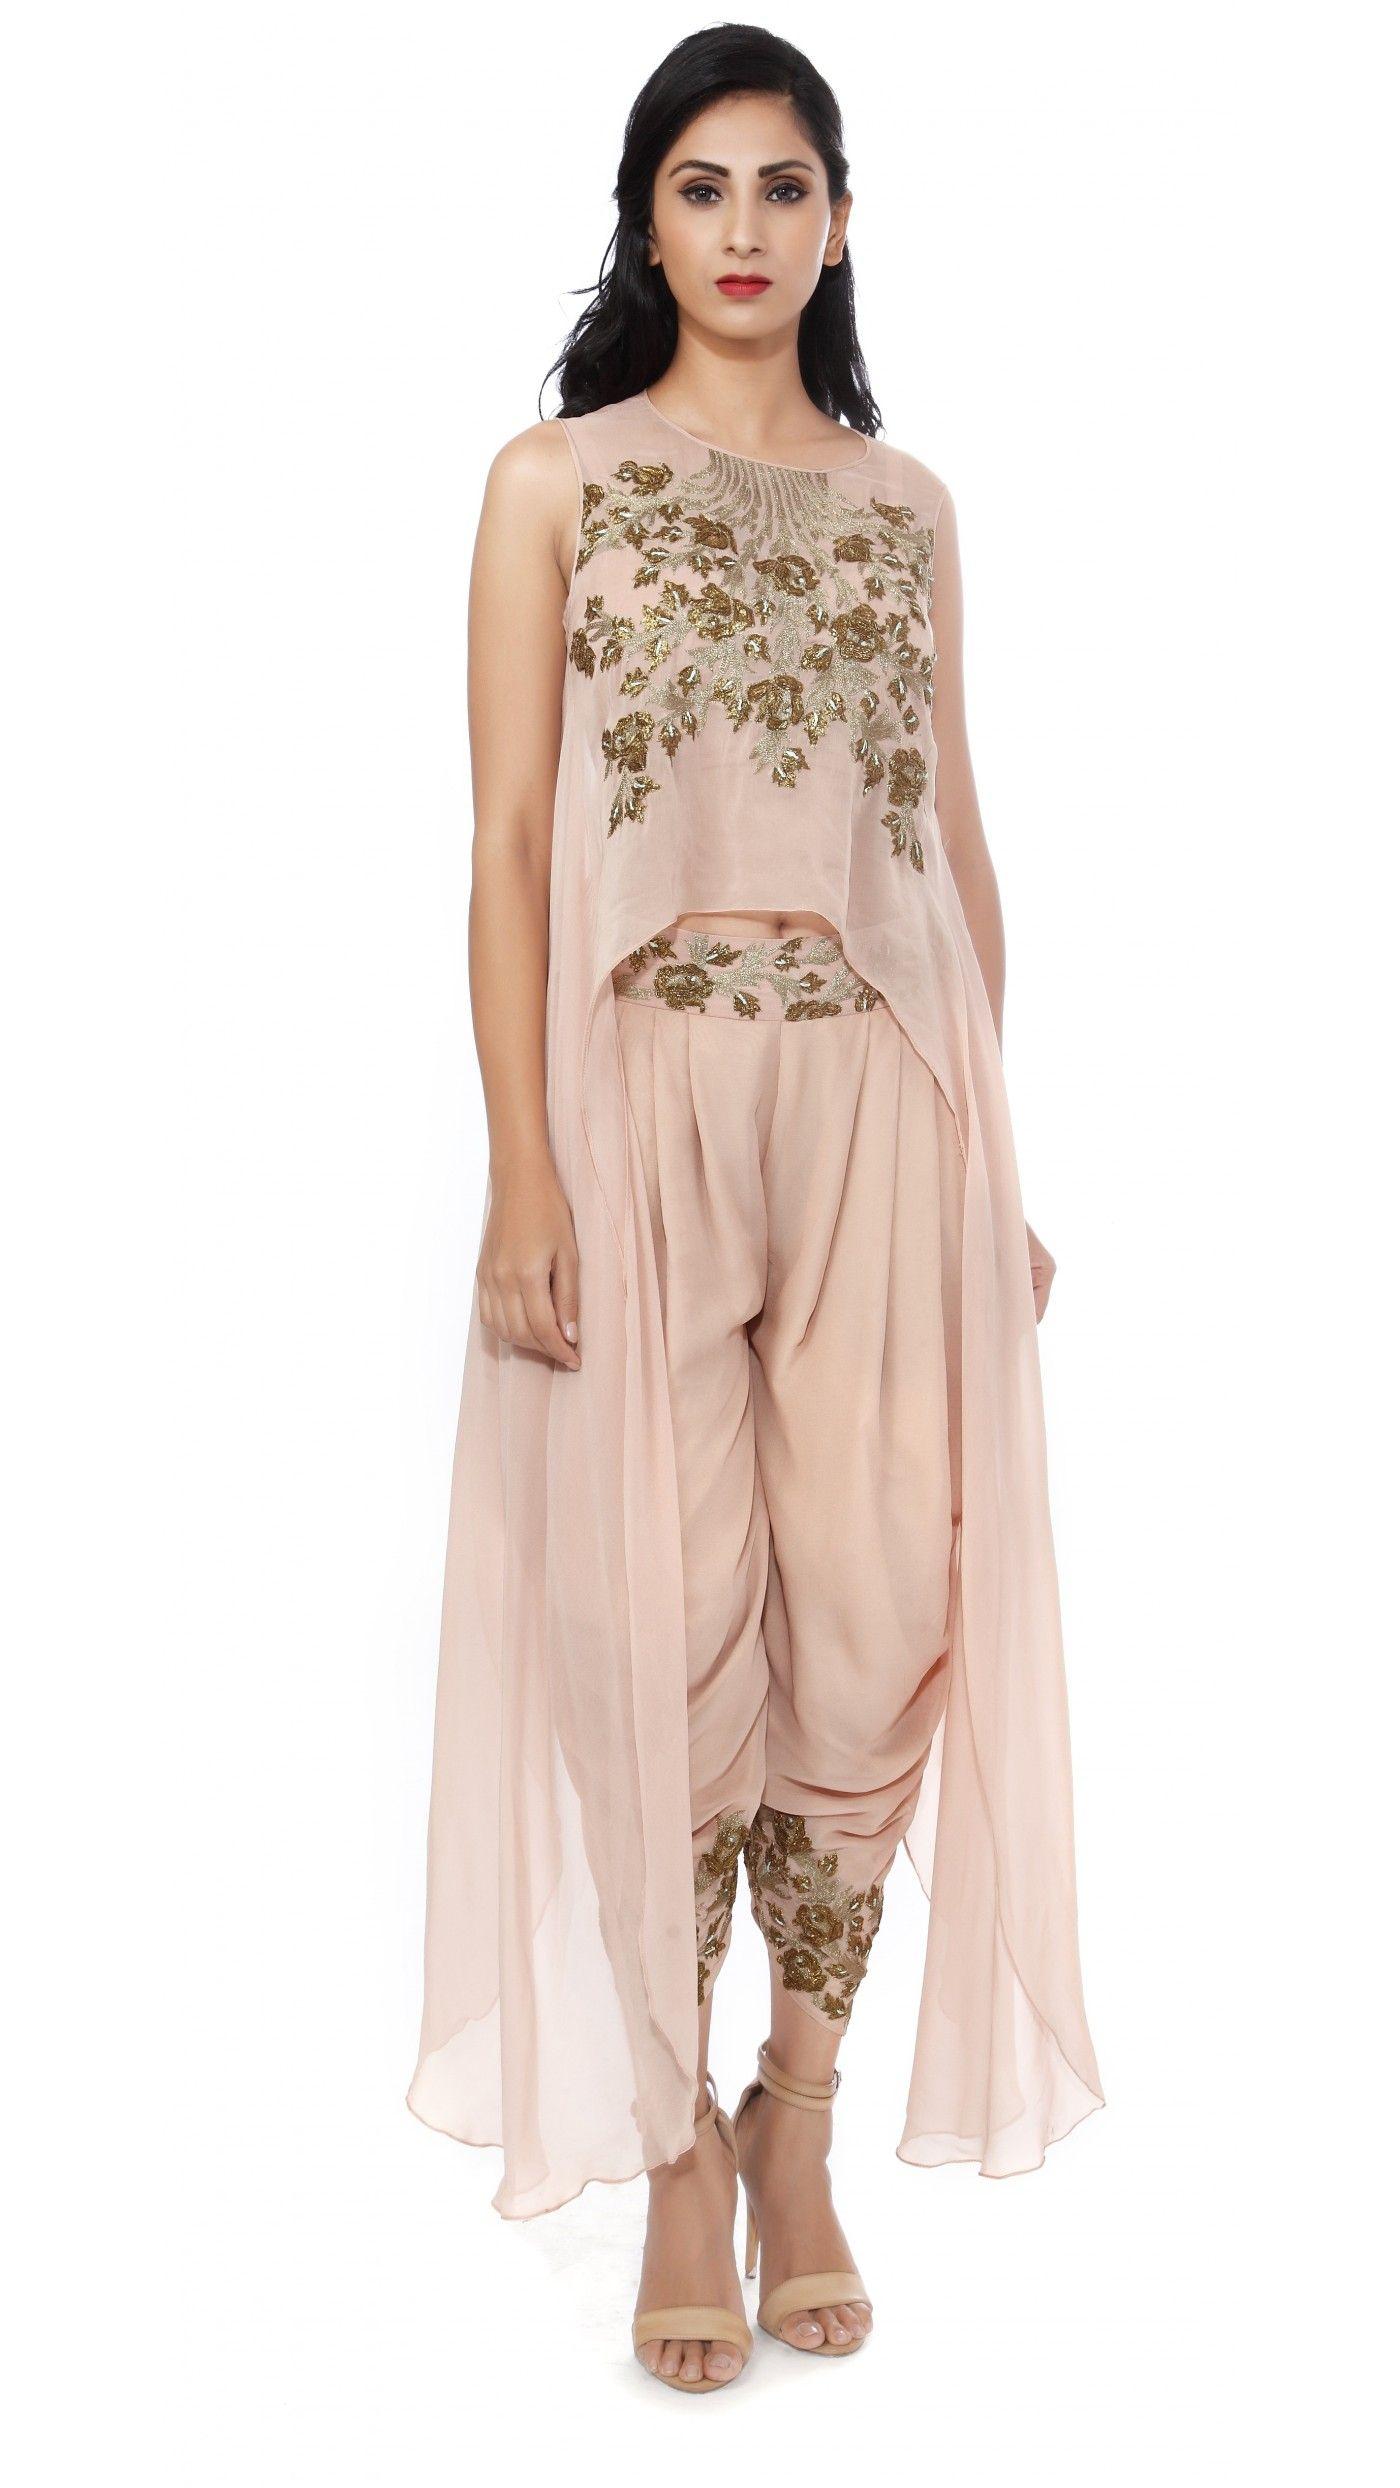 ba1125cdf500cb SVA by Sonam   Paras Modi s Old Rose Asymmetrical Top with Patiala Pants